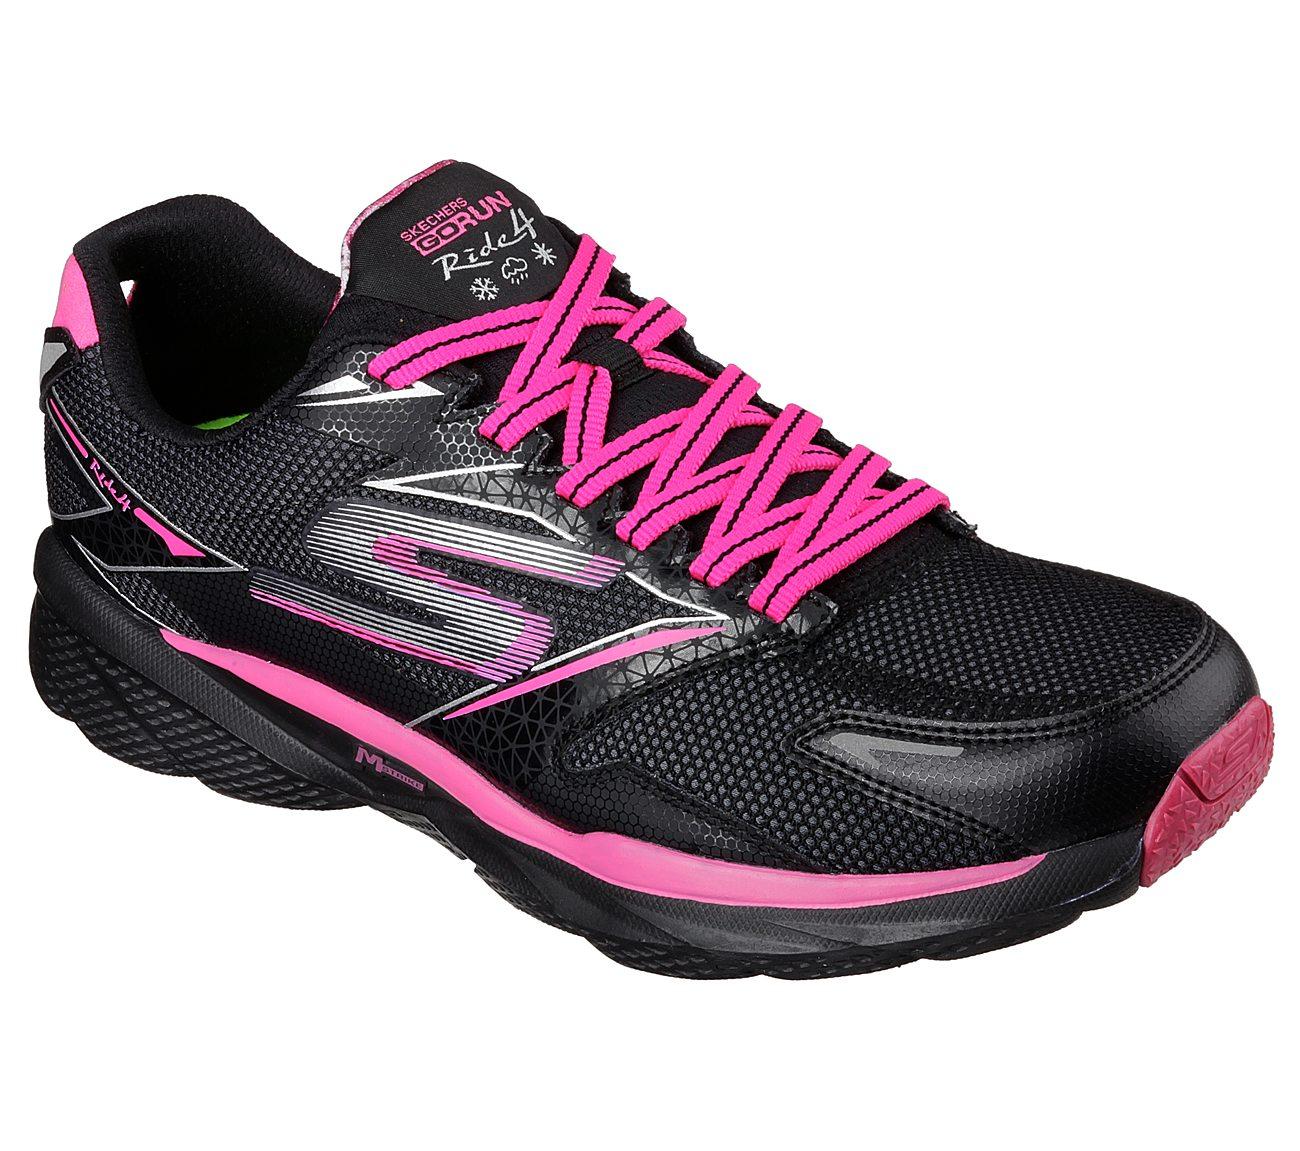 wiggle.co.nz | Skechers Ladies GoRun Ride Shoes AW12 | Internal